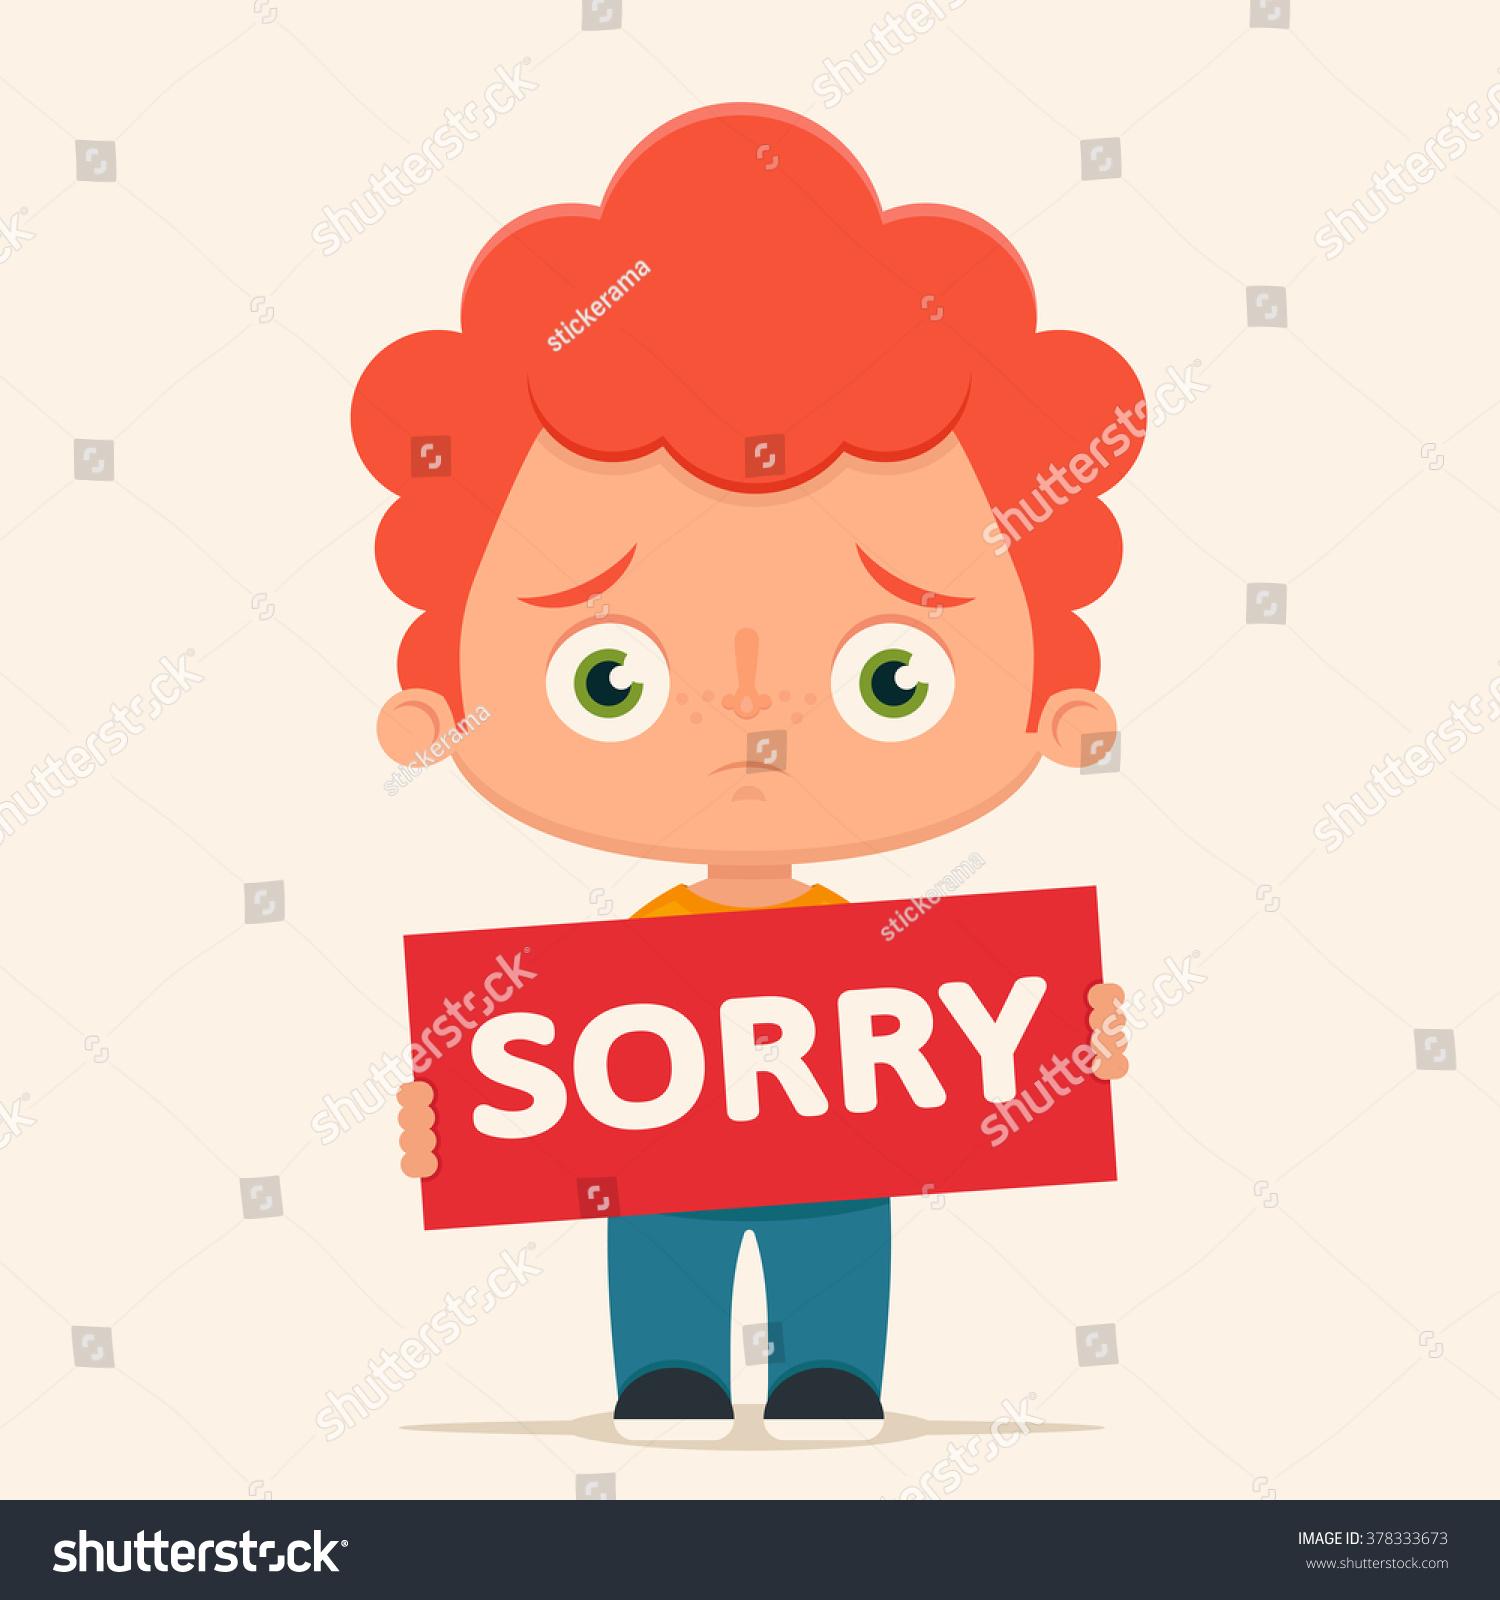 Sad Sorry Images: Sad Cartoon Boy Holding Sorry Sign Stock Vector 378333673